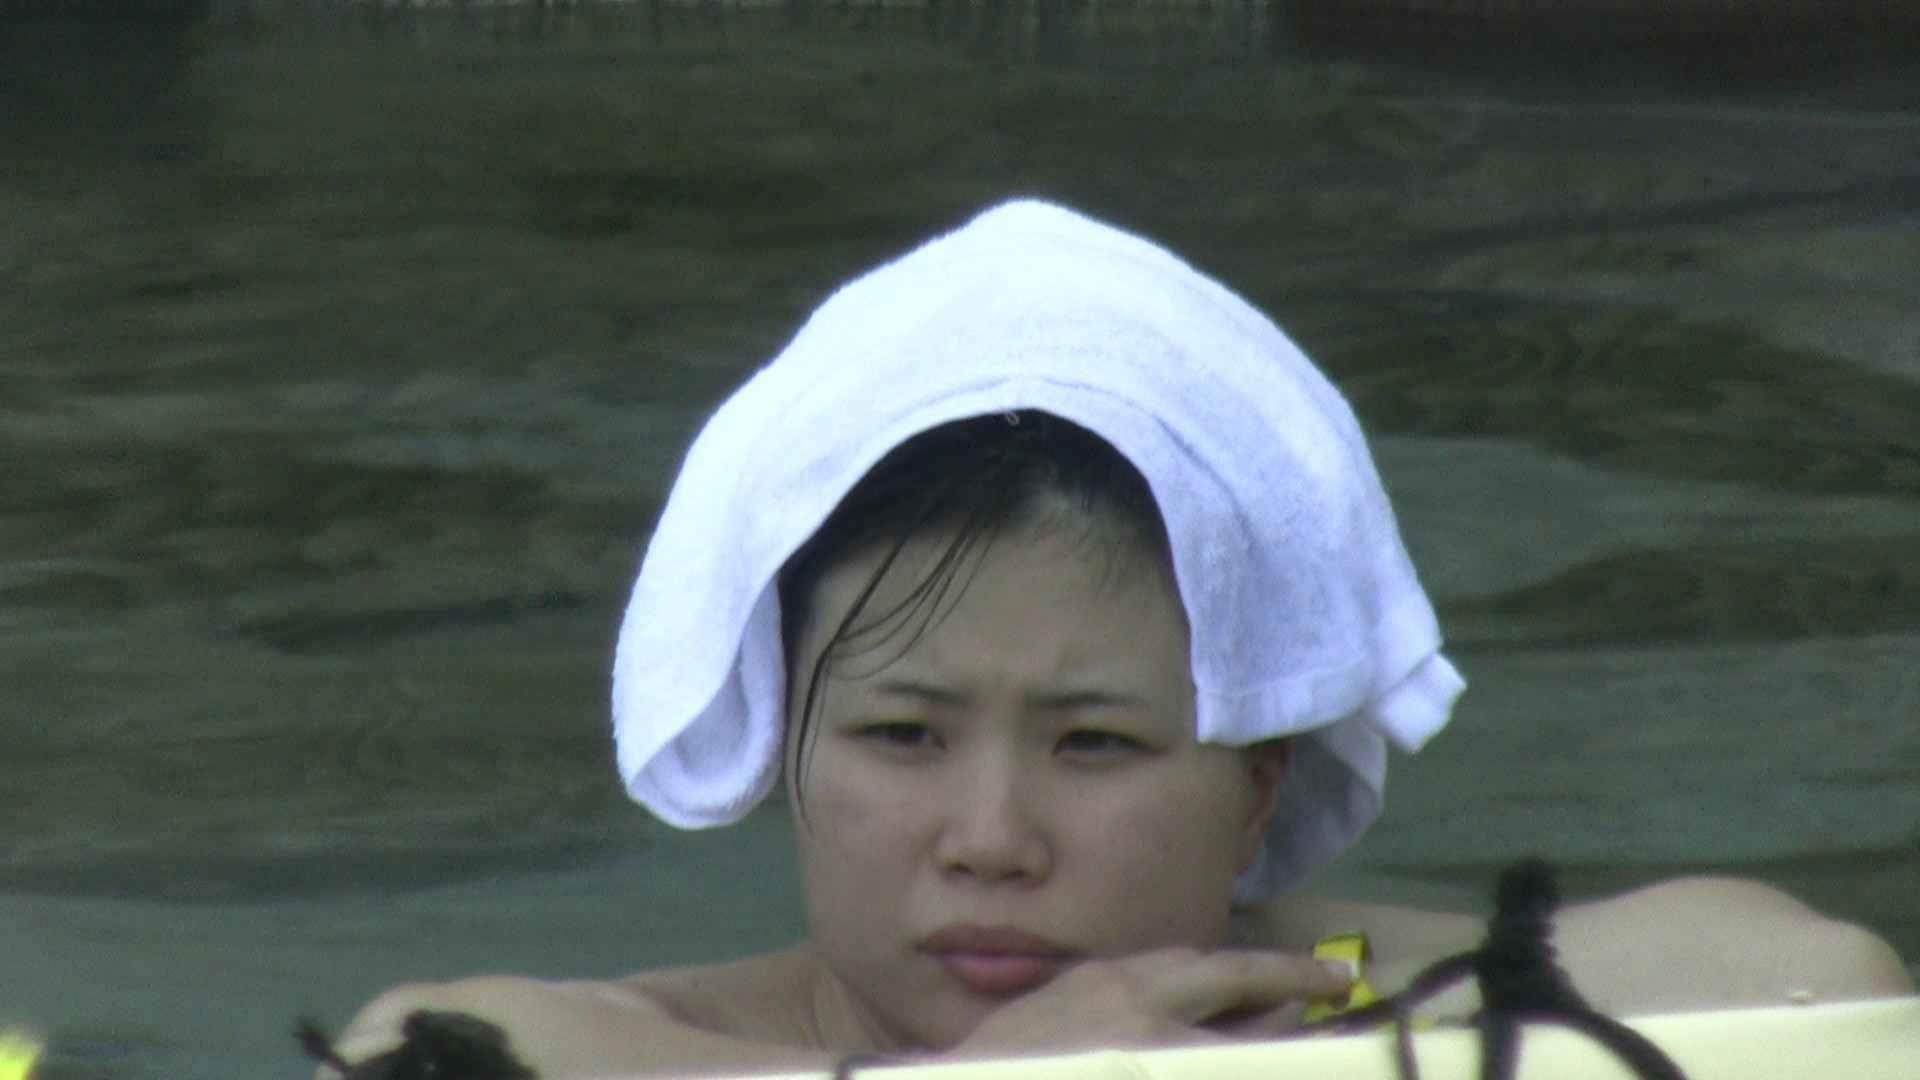 Aquaな露天風呂Vol.183 盗撮師作品 エロ無料画像 105pic 50